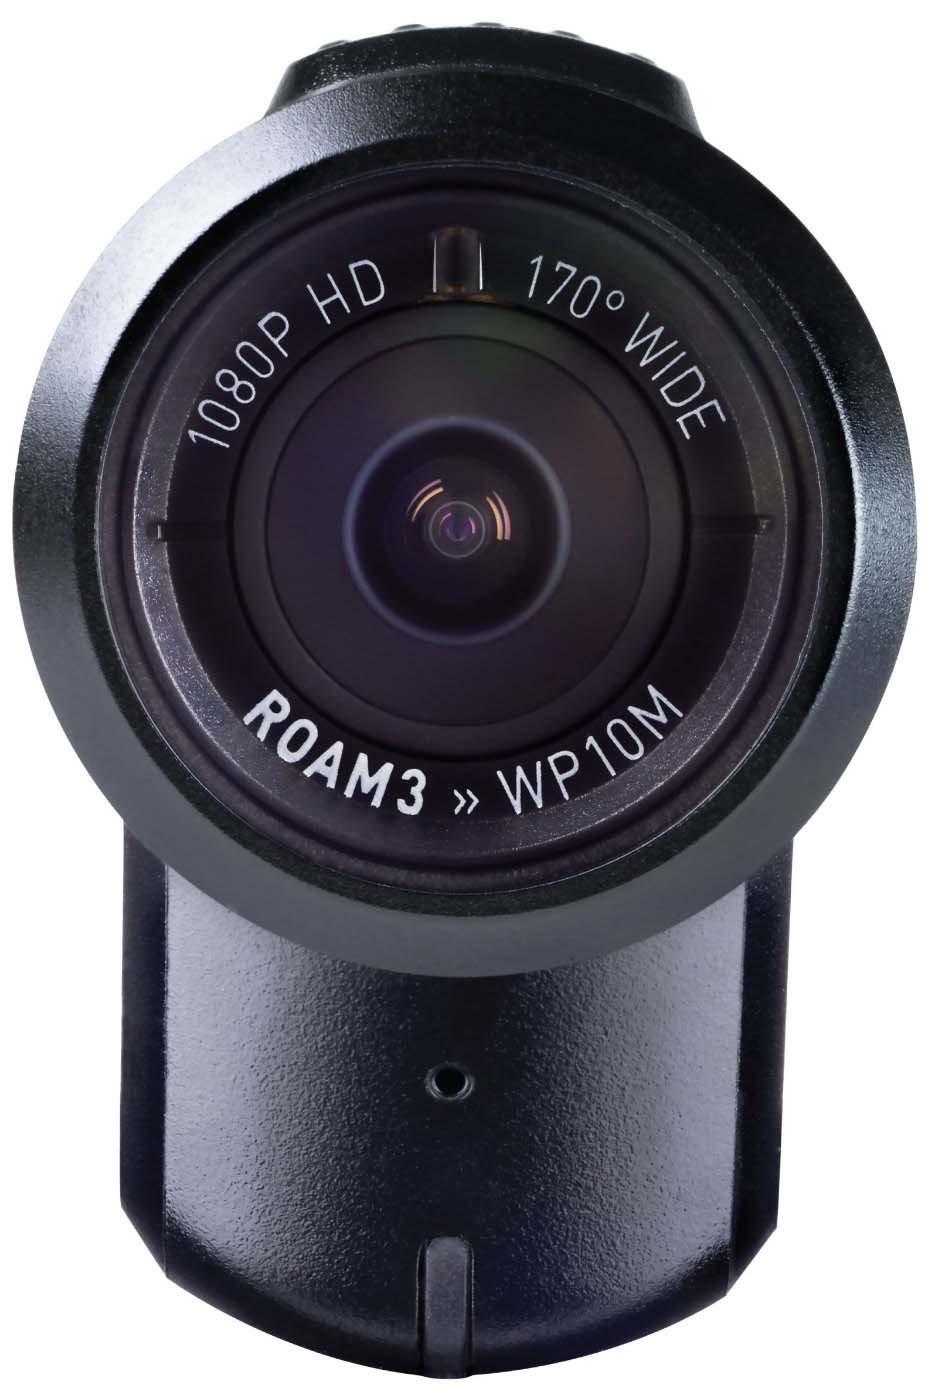 Contour Roam 3 - оптика